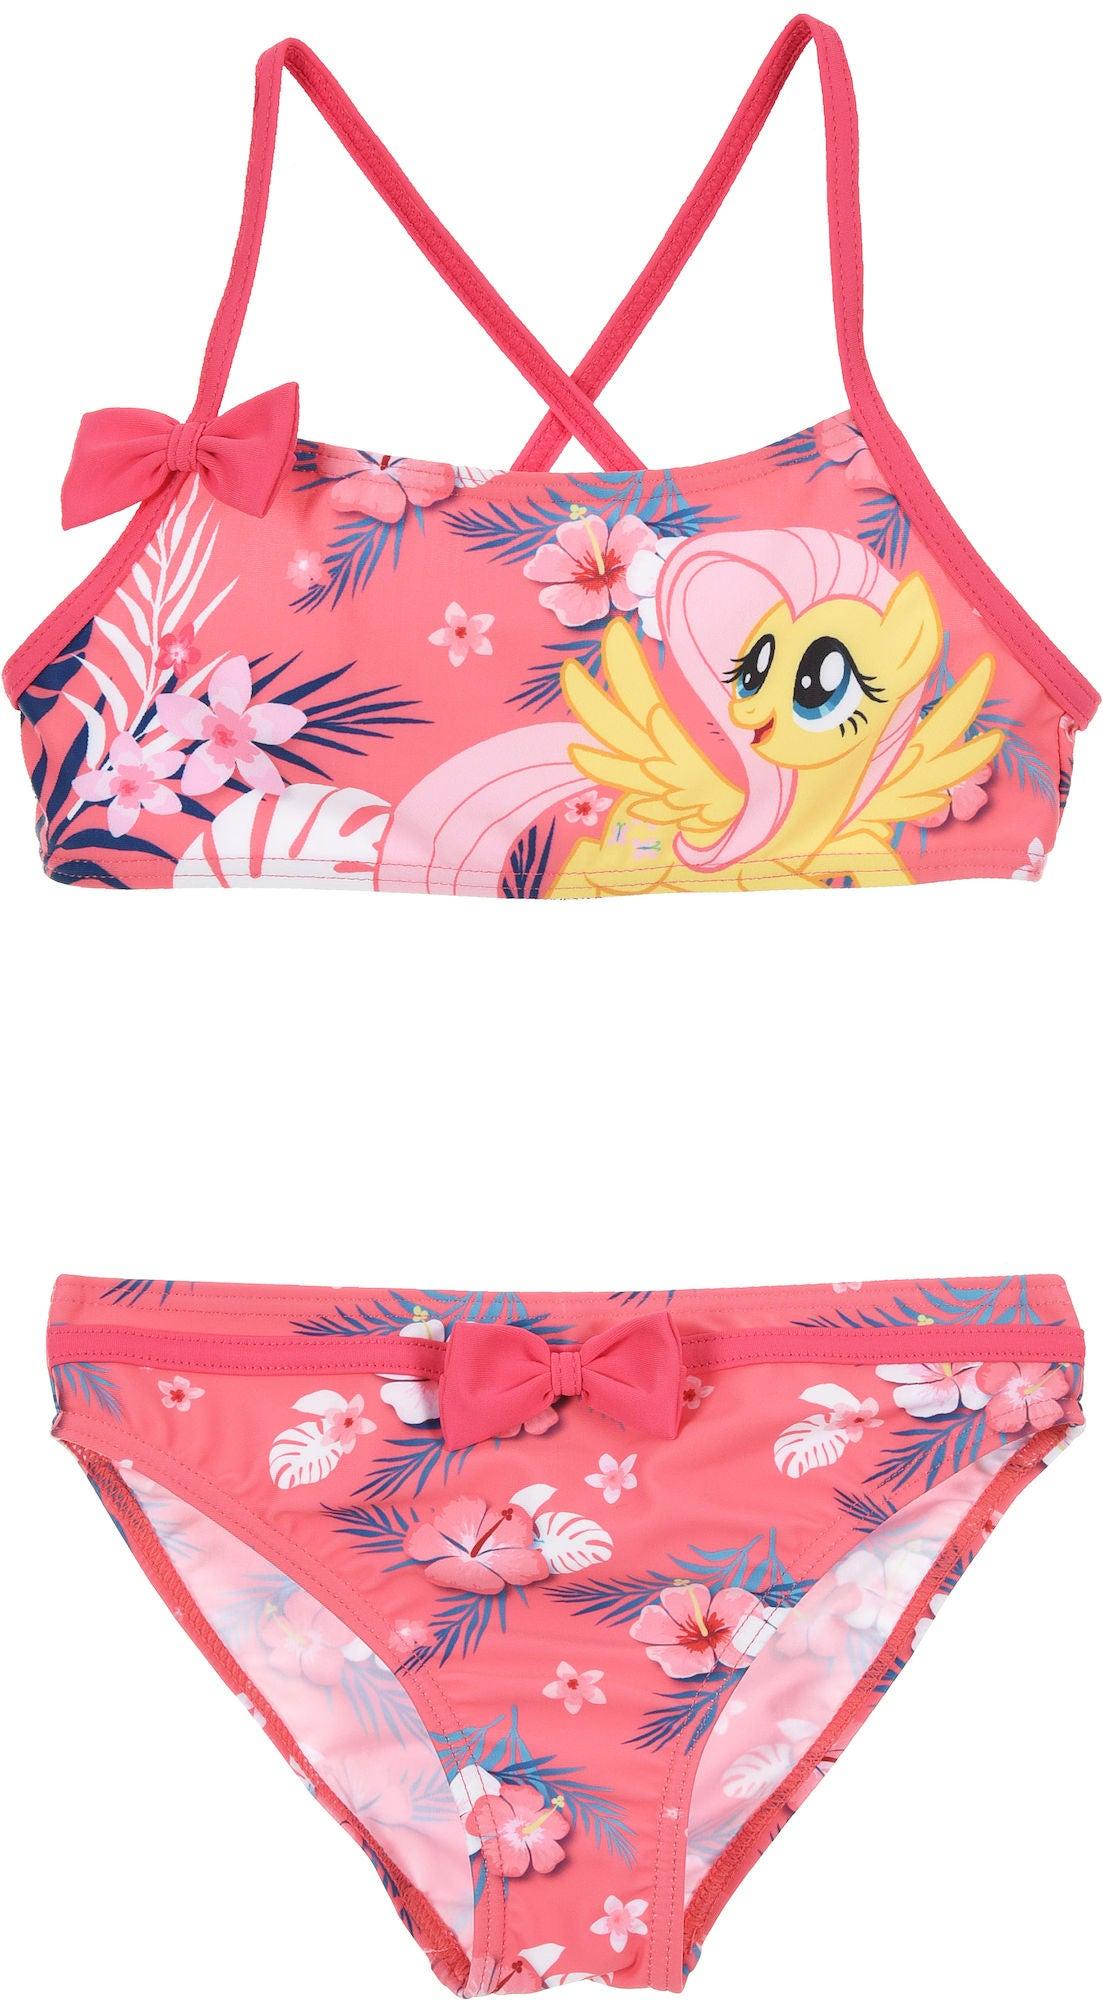 855092a2 Kjøp My Little Pony Bikini, Rosa   Jollyroom